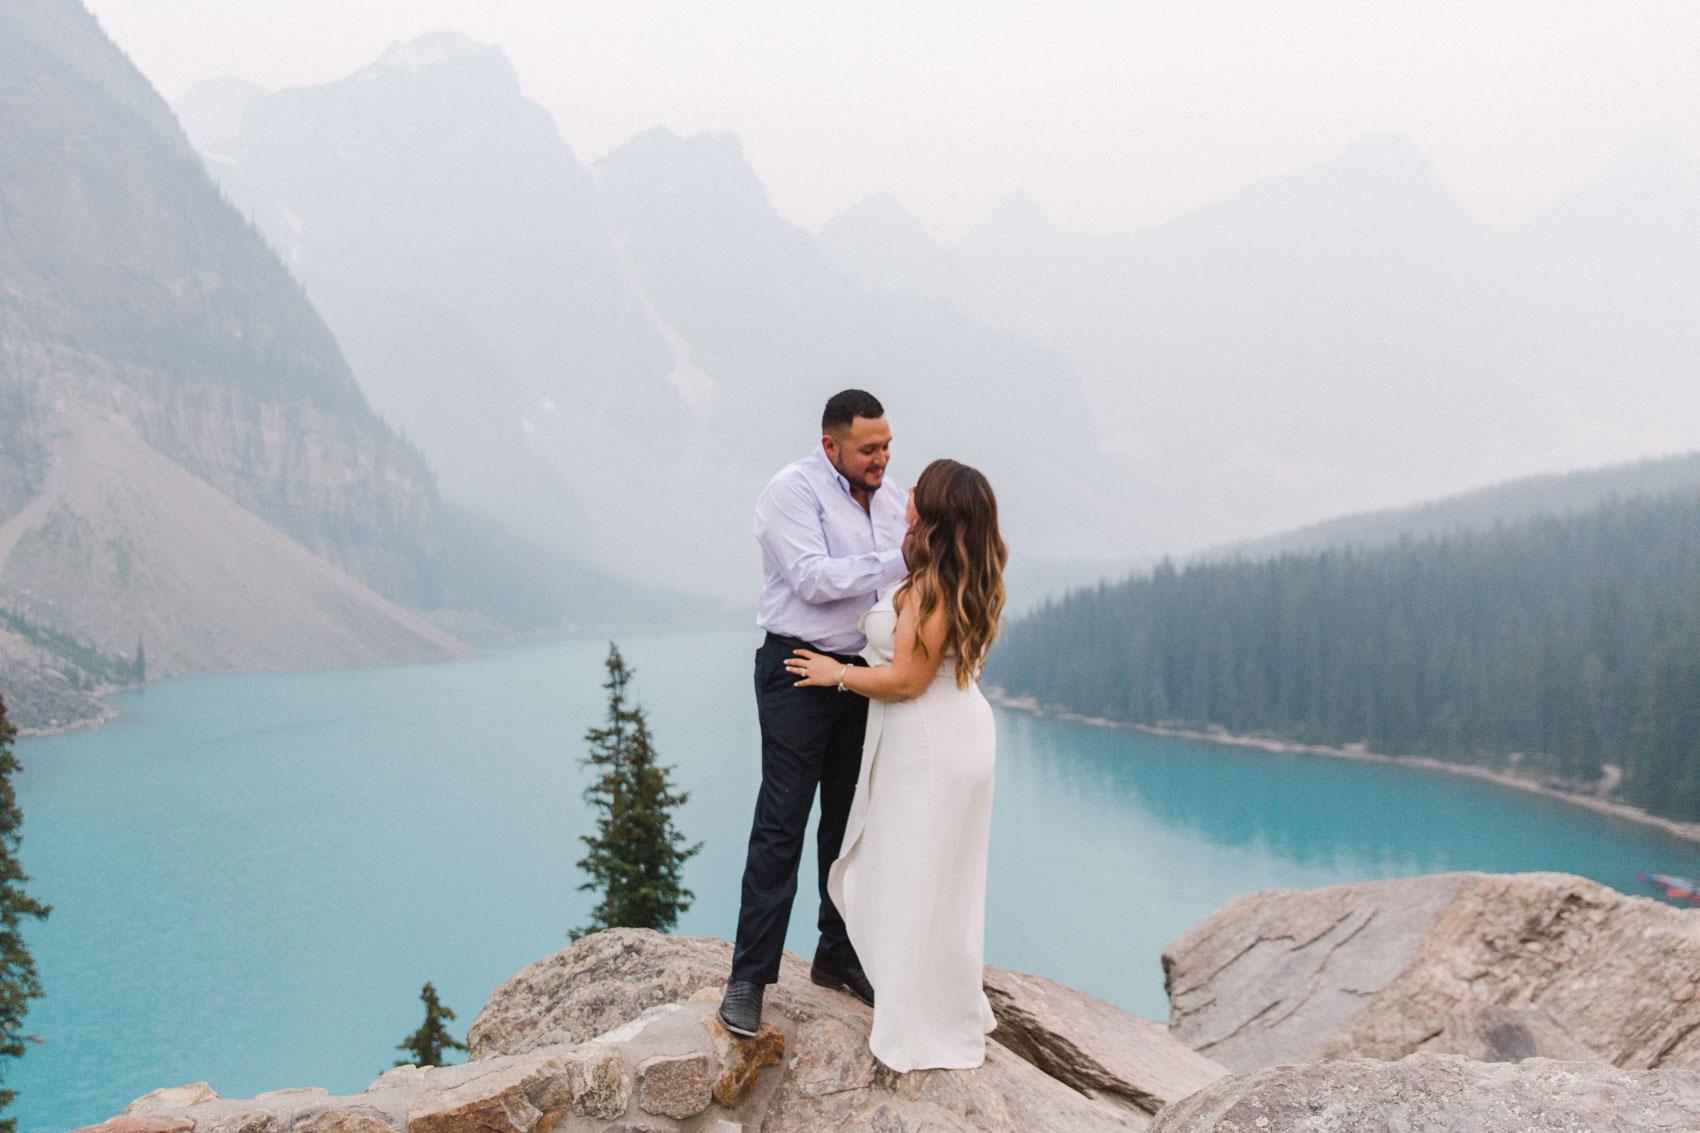 Lake Louise Mountain Engagement Photographer Moraine Lake Wedding Jennie Guenard Photography-23.jpg